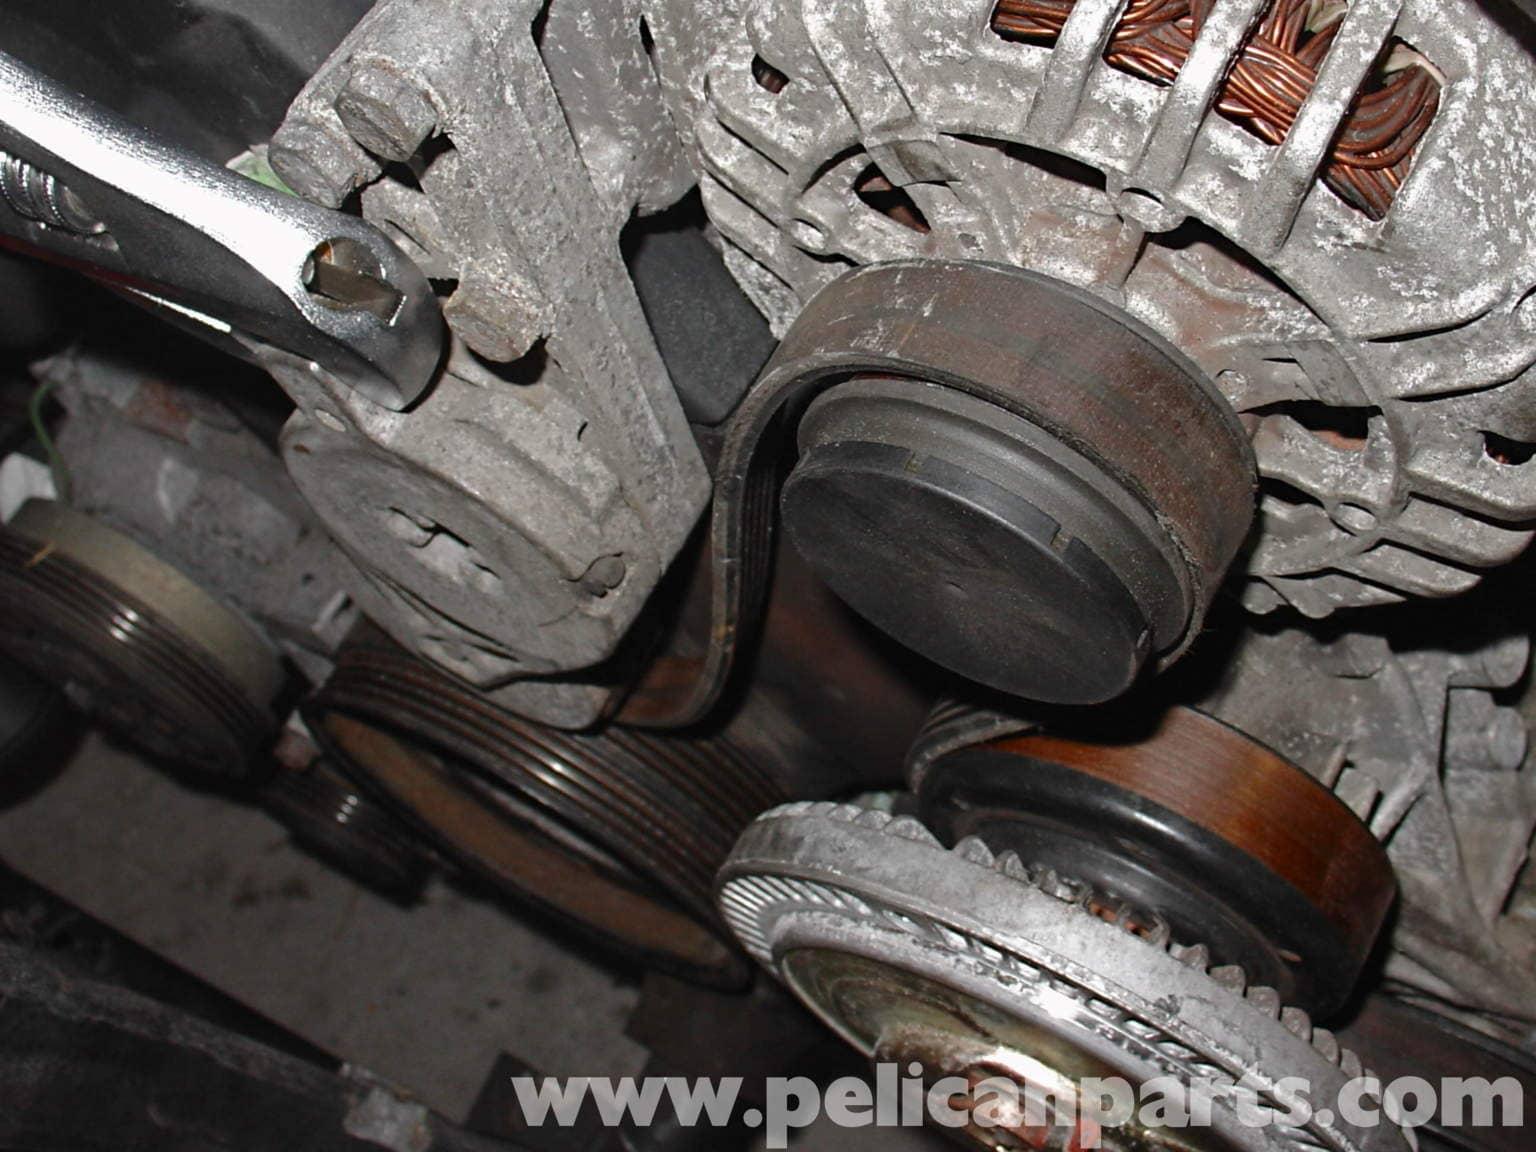 Audi A4 1.8T Volkswagen Serpentine Belt Replacement   Golf, Jetta, Passat & Beetle   Pelican ...